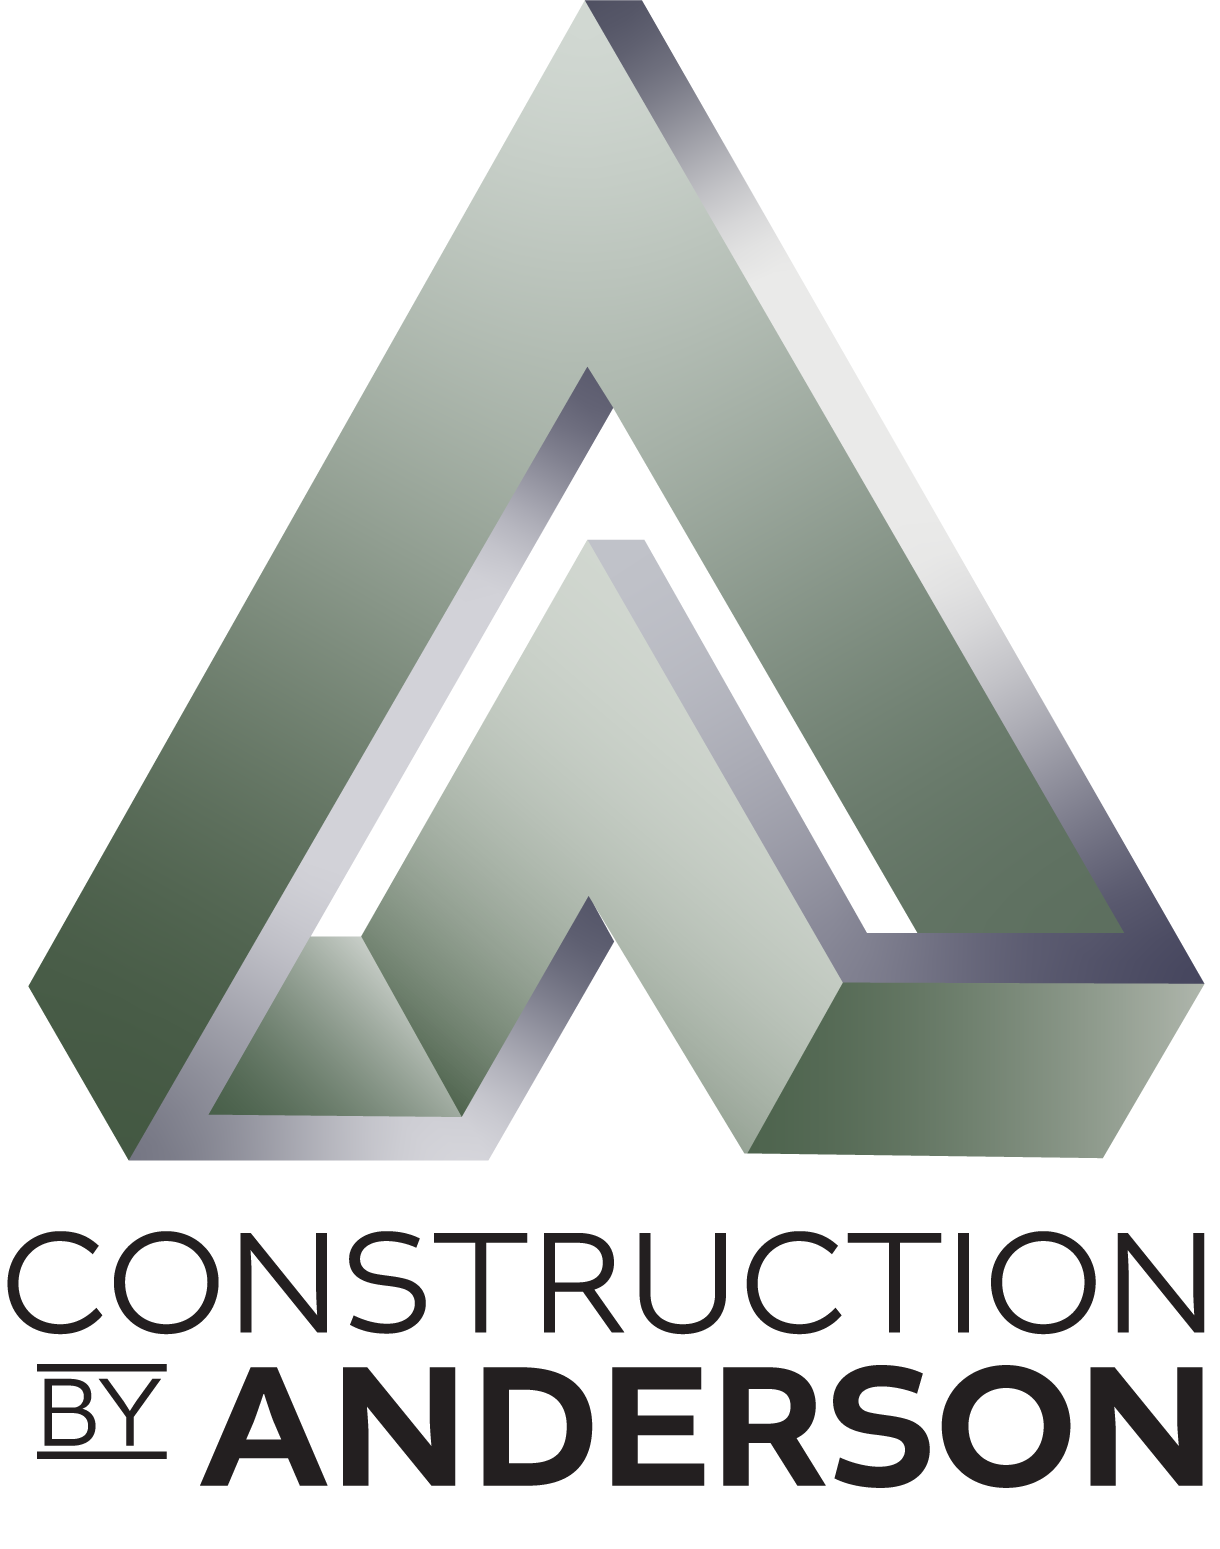 Roofing Contractors Near Wareham Ma Better Business Bureau Start With Trust